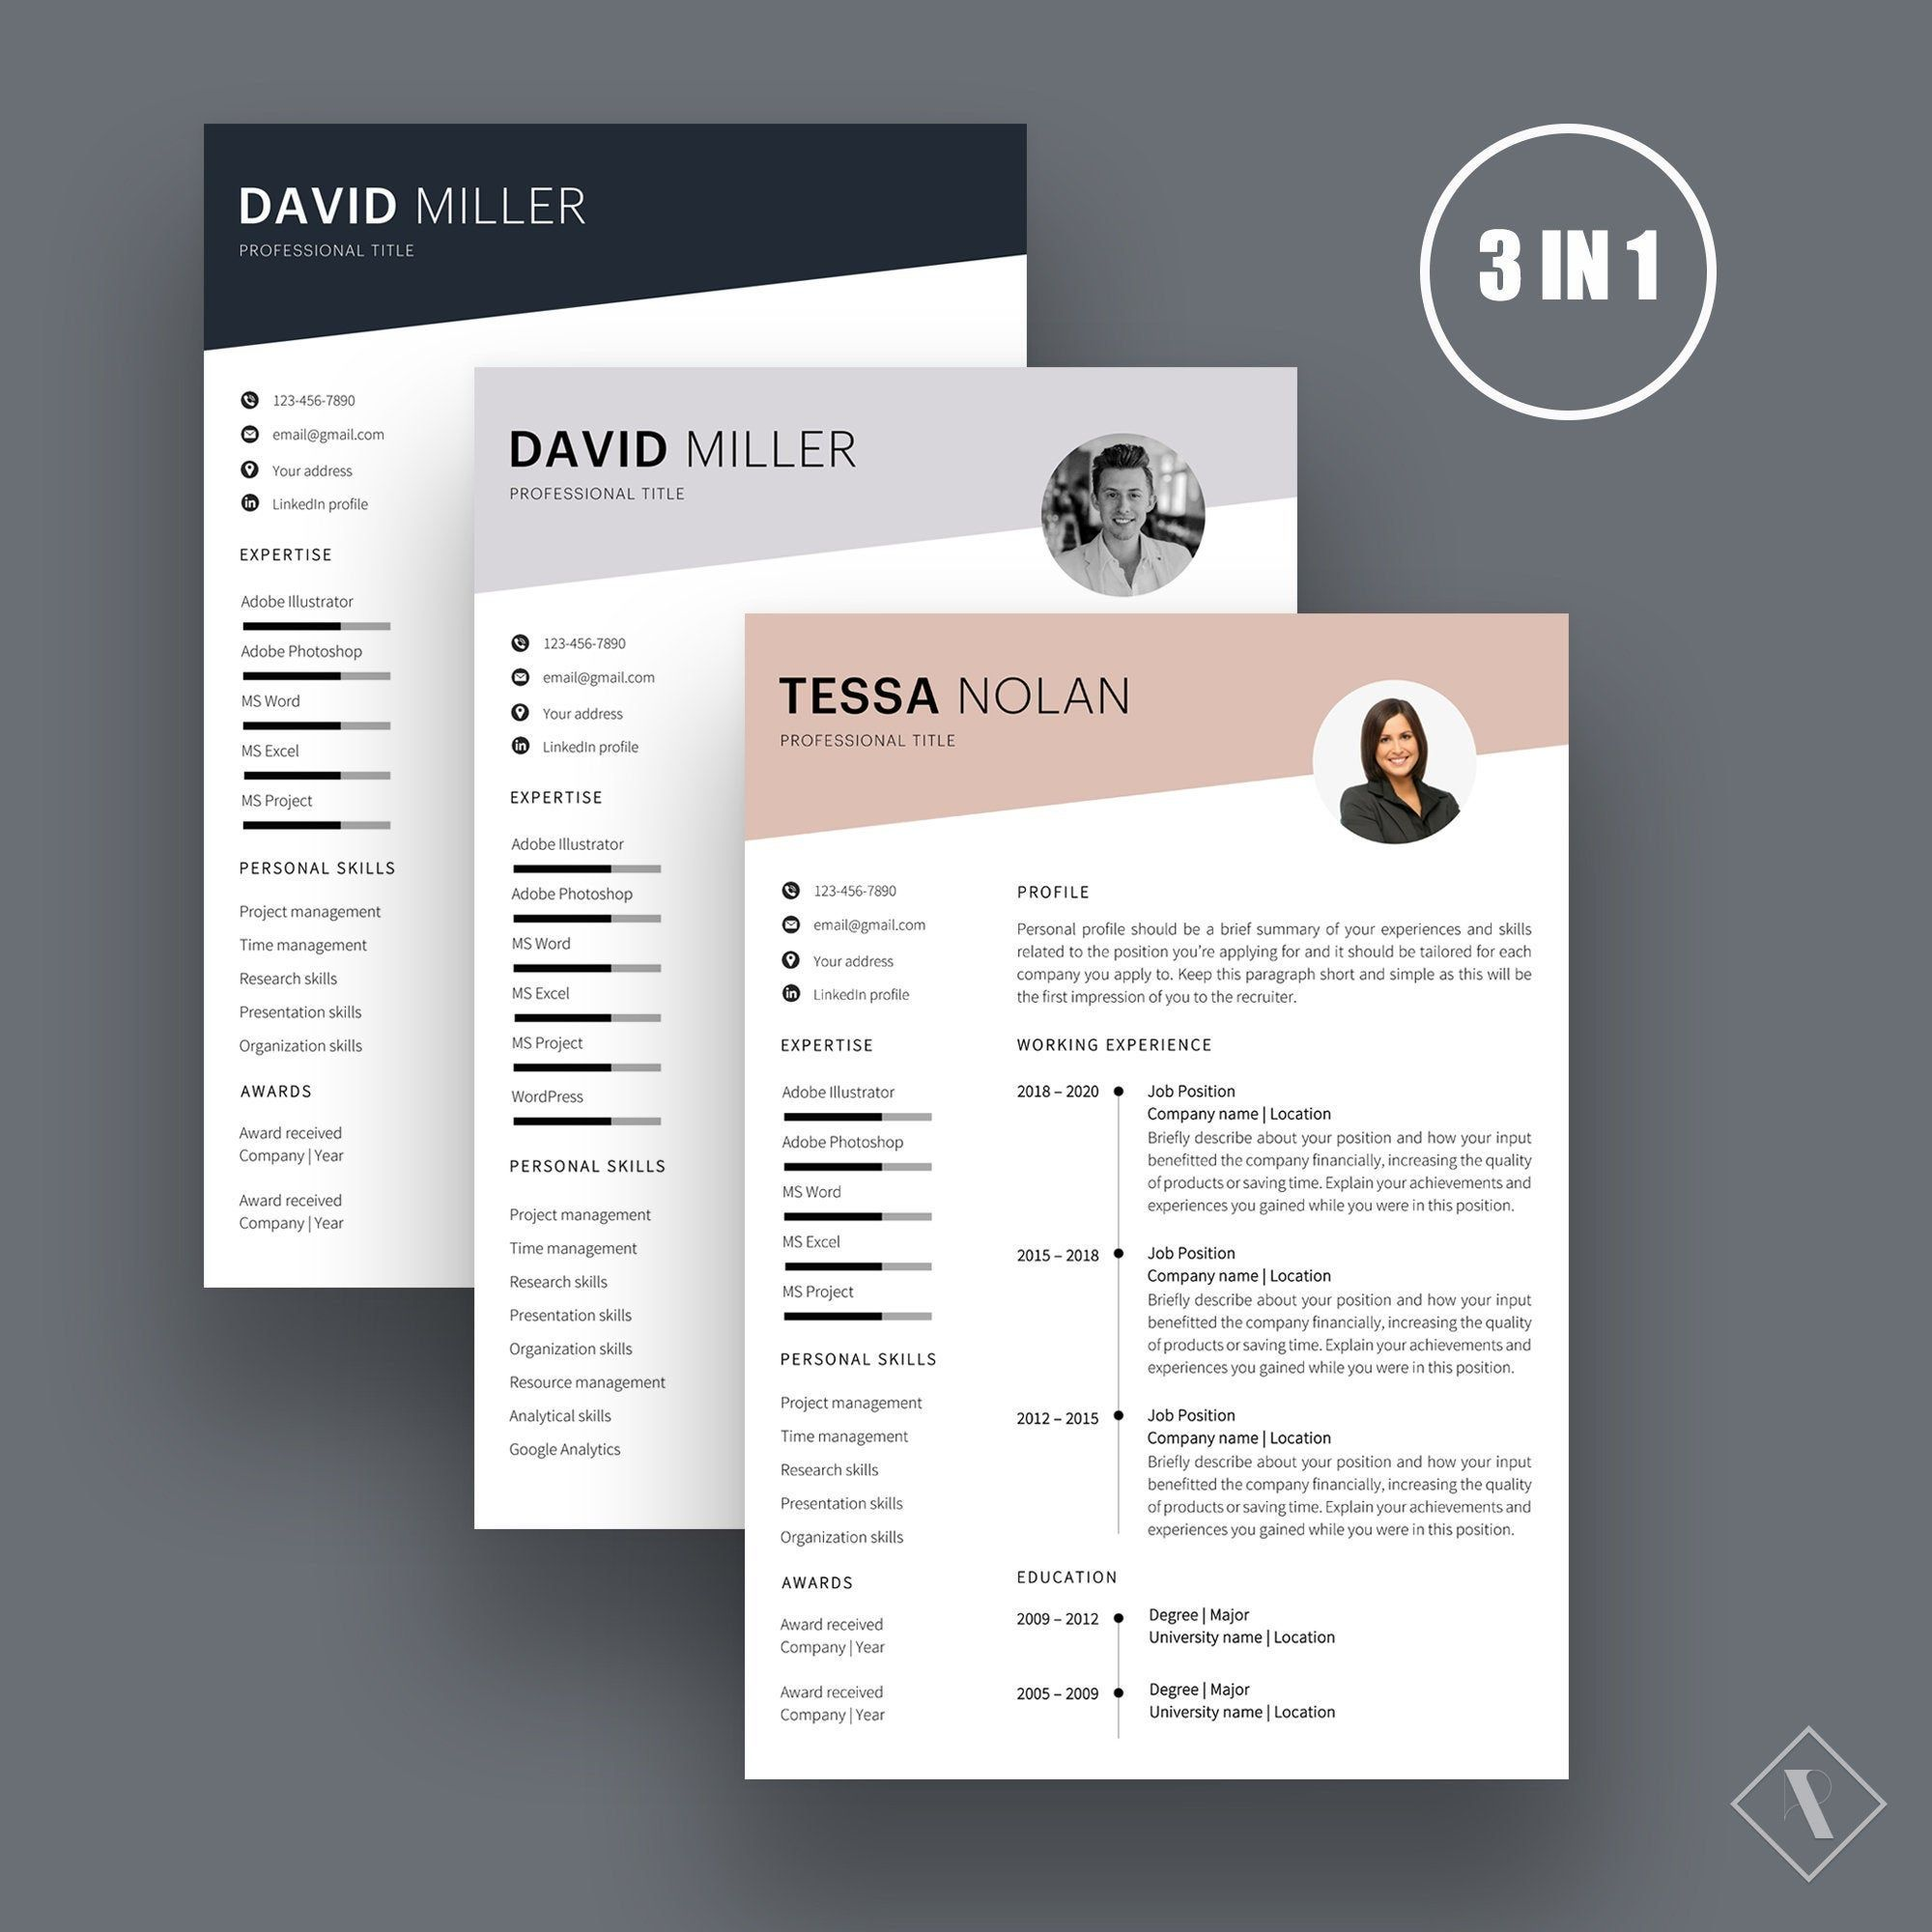 Resume Template Curriculum Vitae Cv Template Modern Resume Etsy Resume Template Cv Template One Page Resume